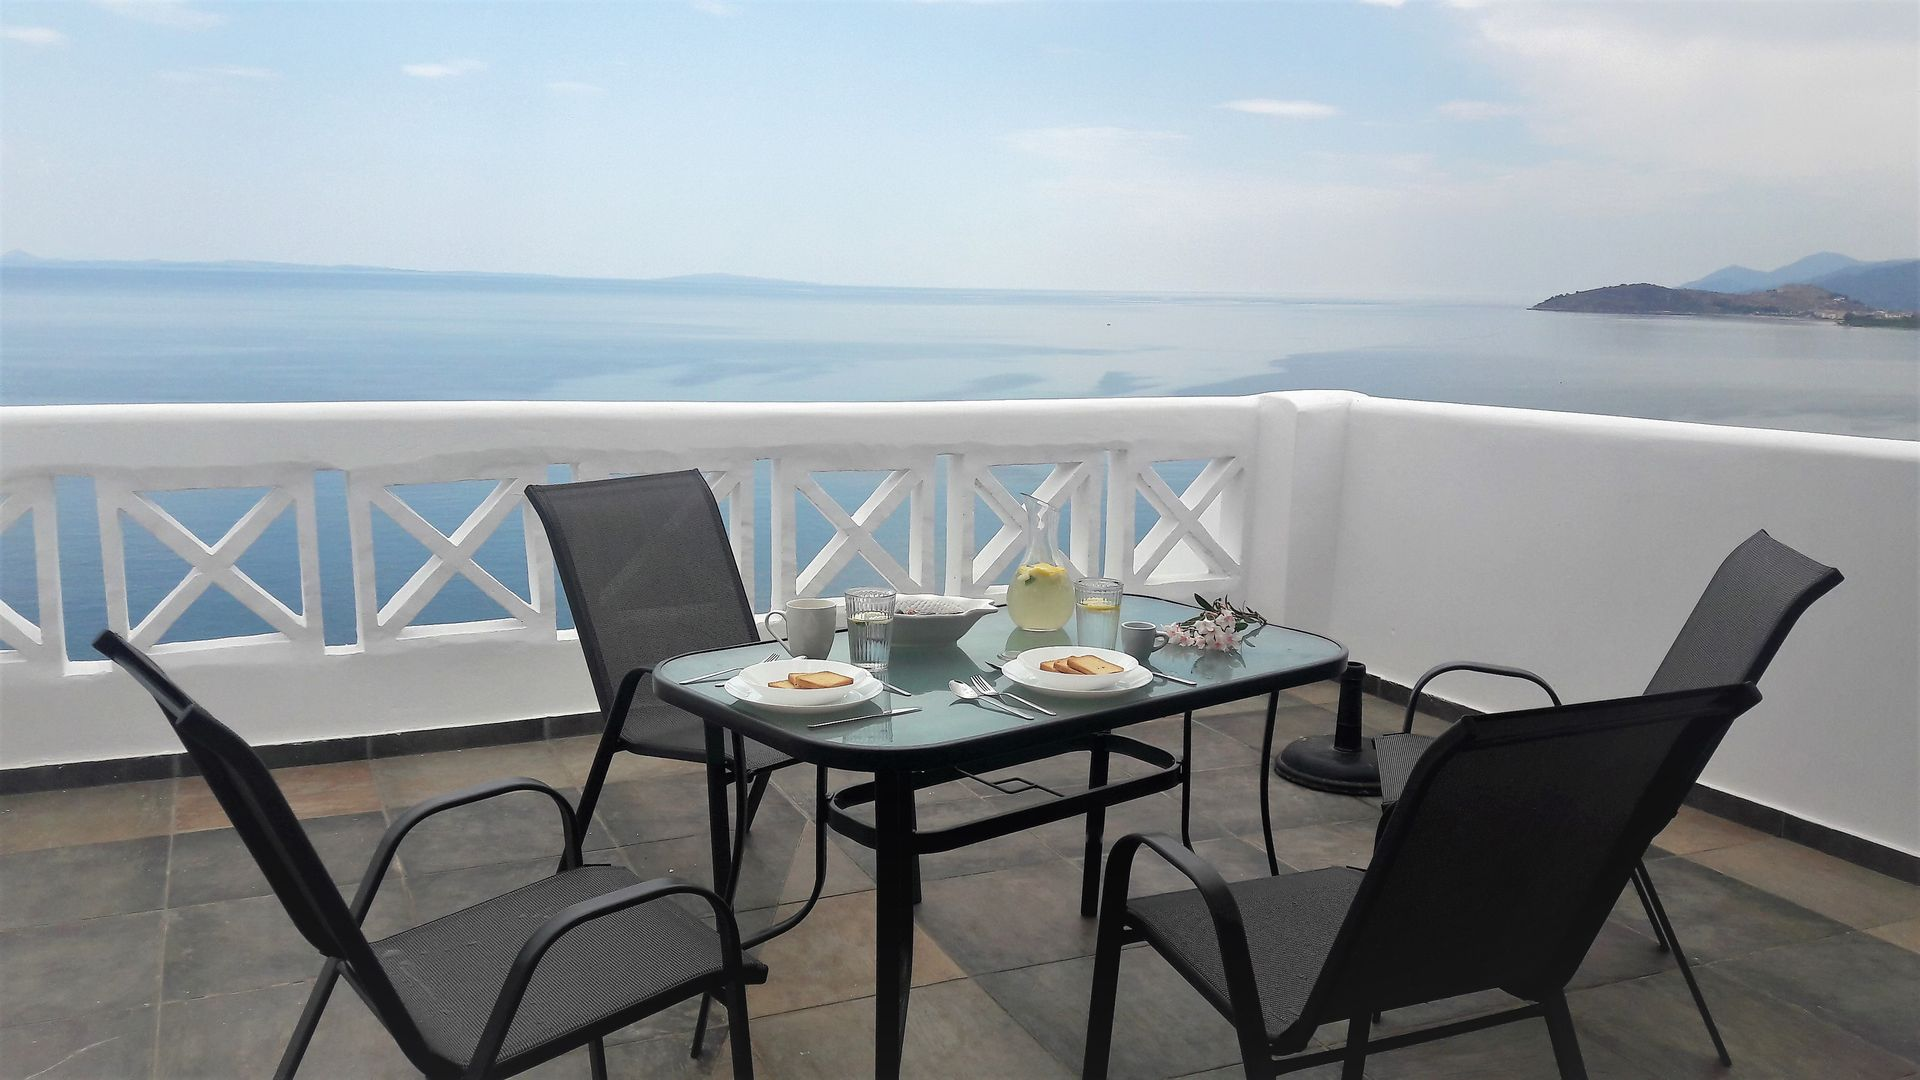 Muses SeaSide Villas - Παράλιο Άστρος, Κυνουρία ✦ 5 Ημέρες (4 Διανυκτερεύσεις) ✦ 2 άτομα + 1 παιδί έως 3 ετών ✦ Χωρίς Πρωινό ✦ 01/07/2021 έως 31/08/2021 ✦ Κοντά σε παραλία!